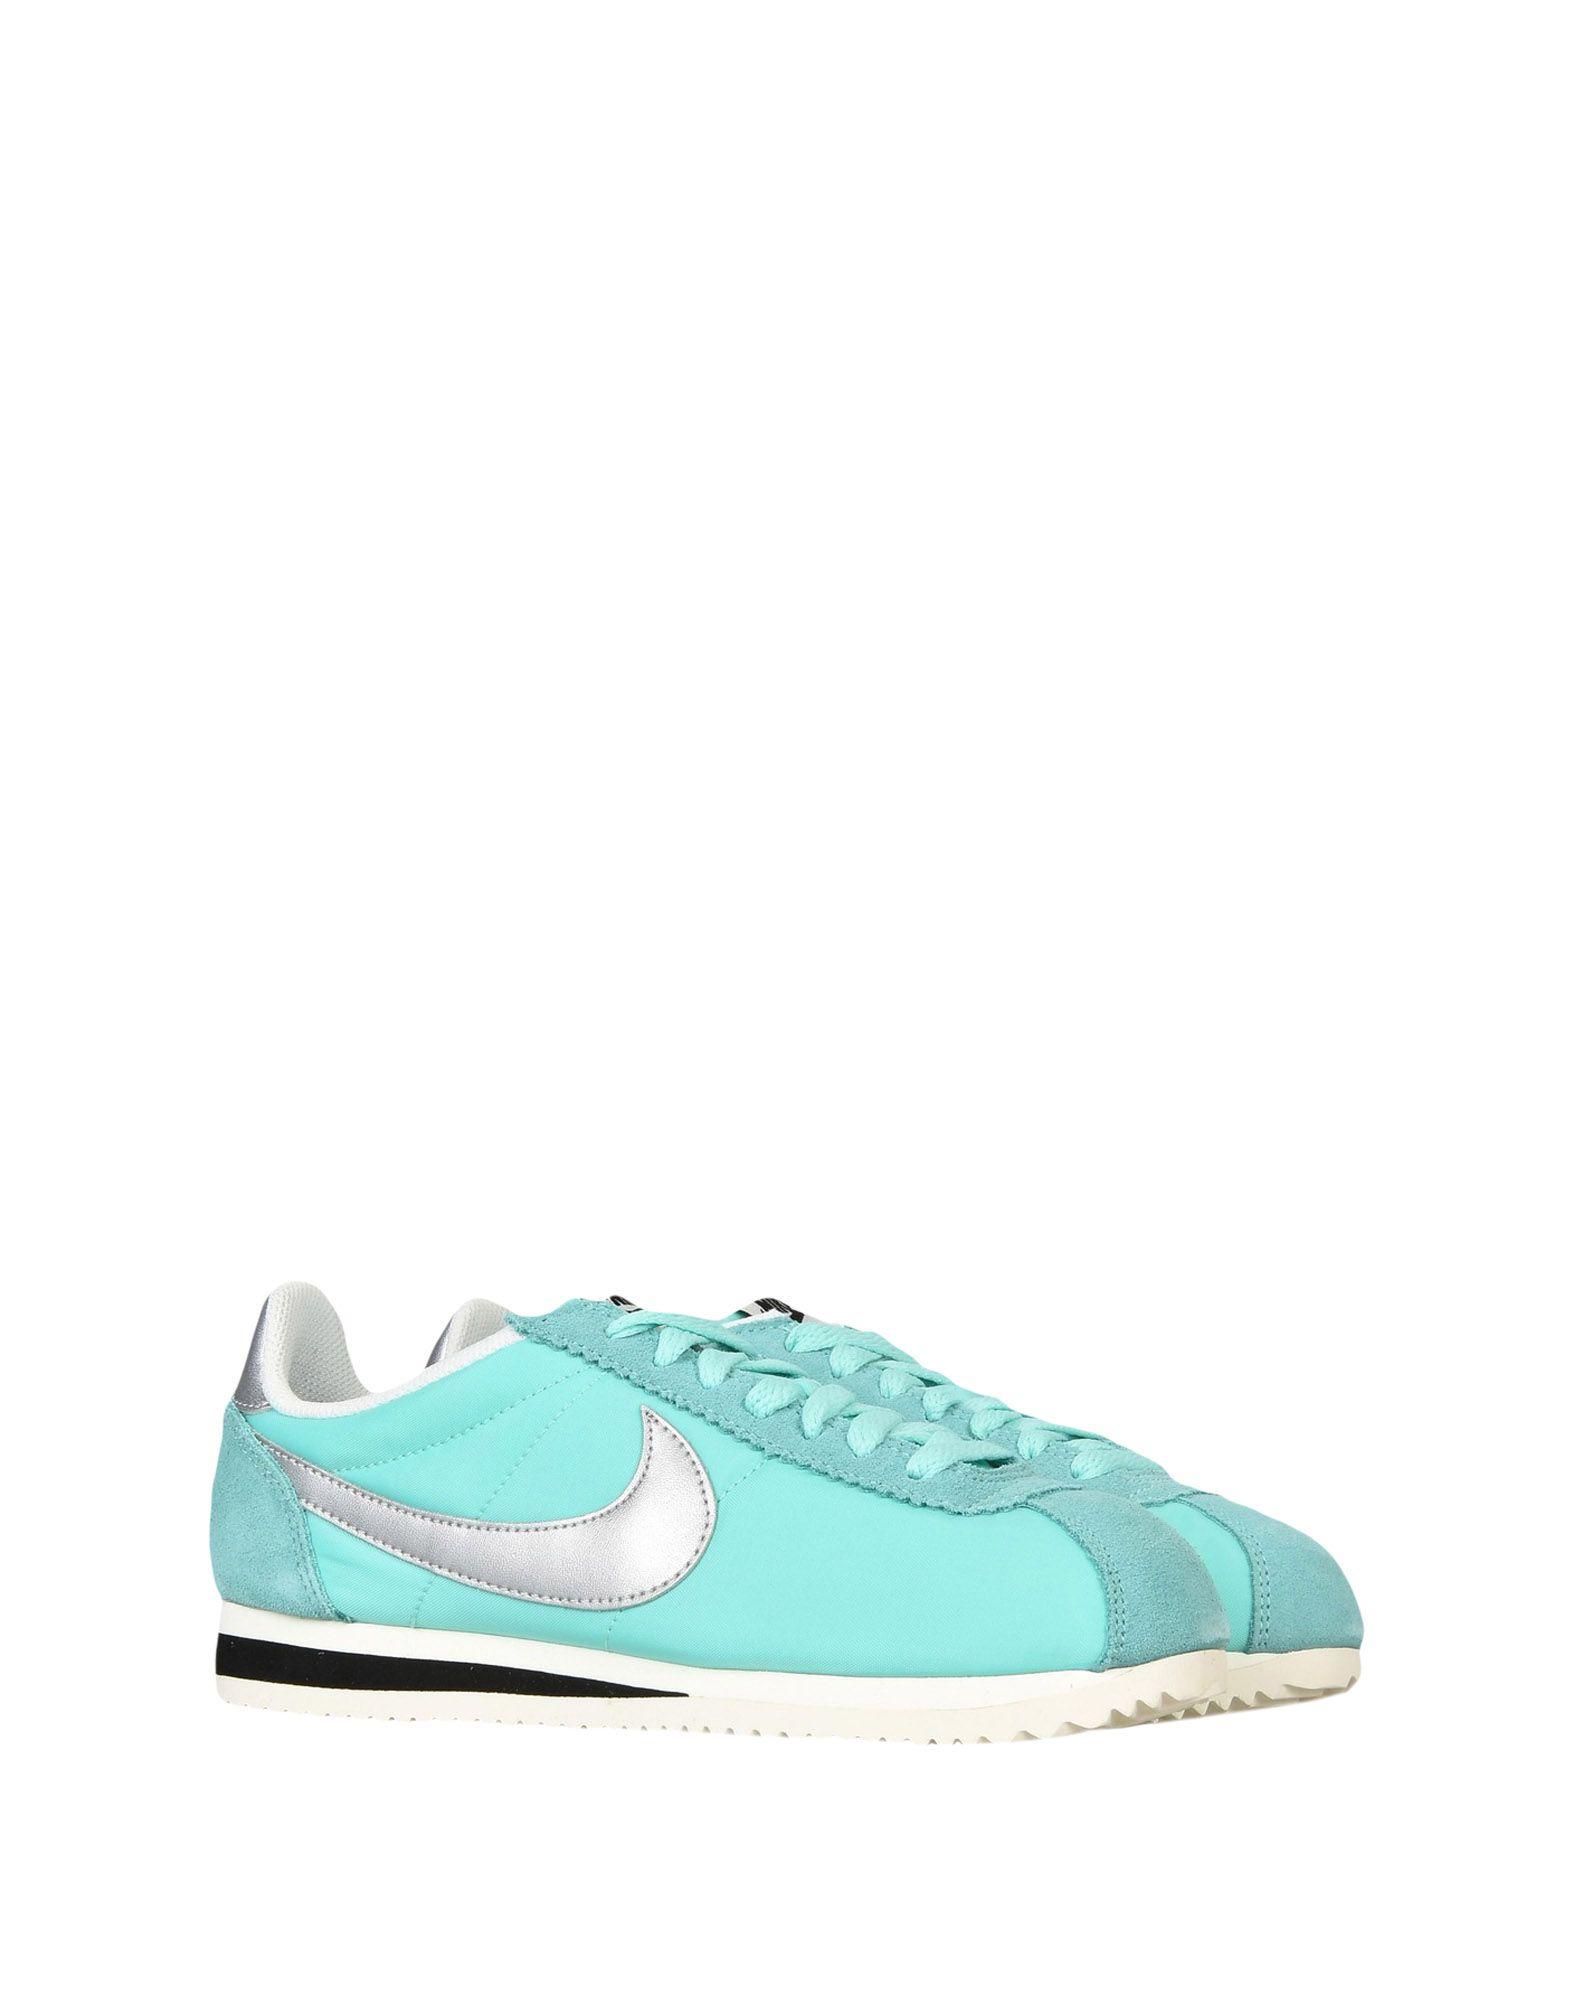 Sneakers Nike Classic Cortez Nylon Prem - Femme - Sneakers Nike sur